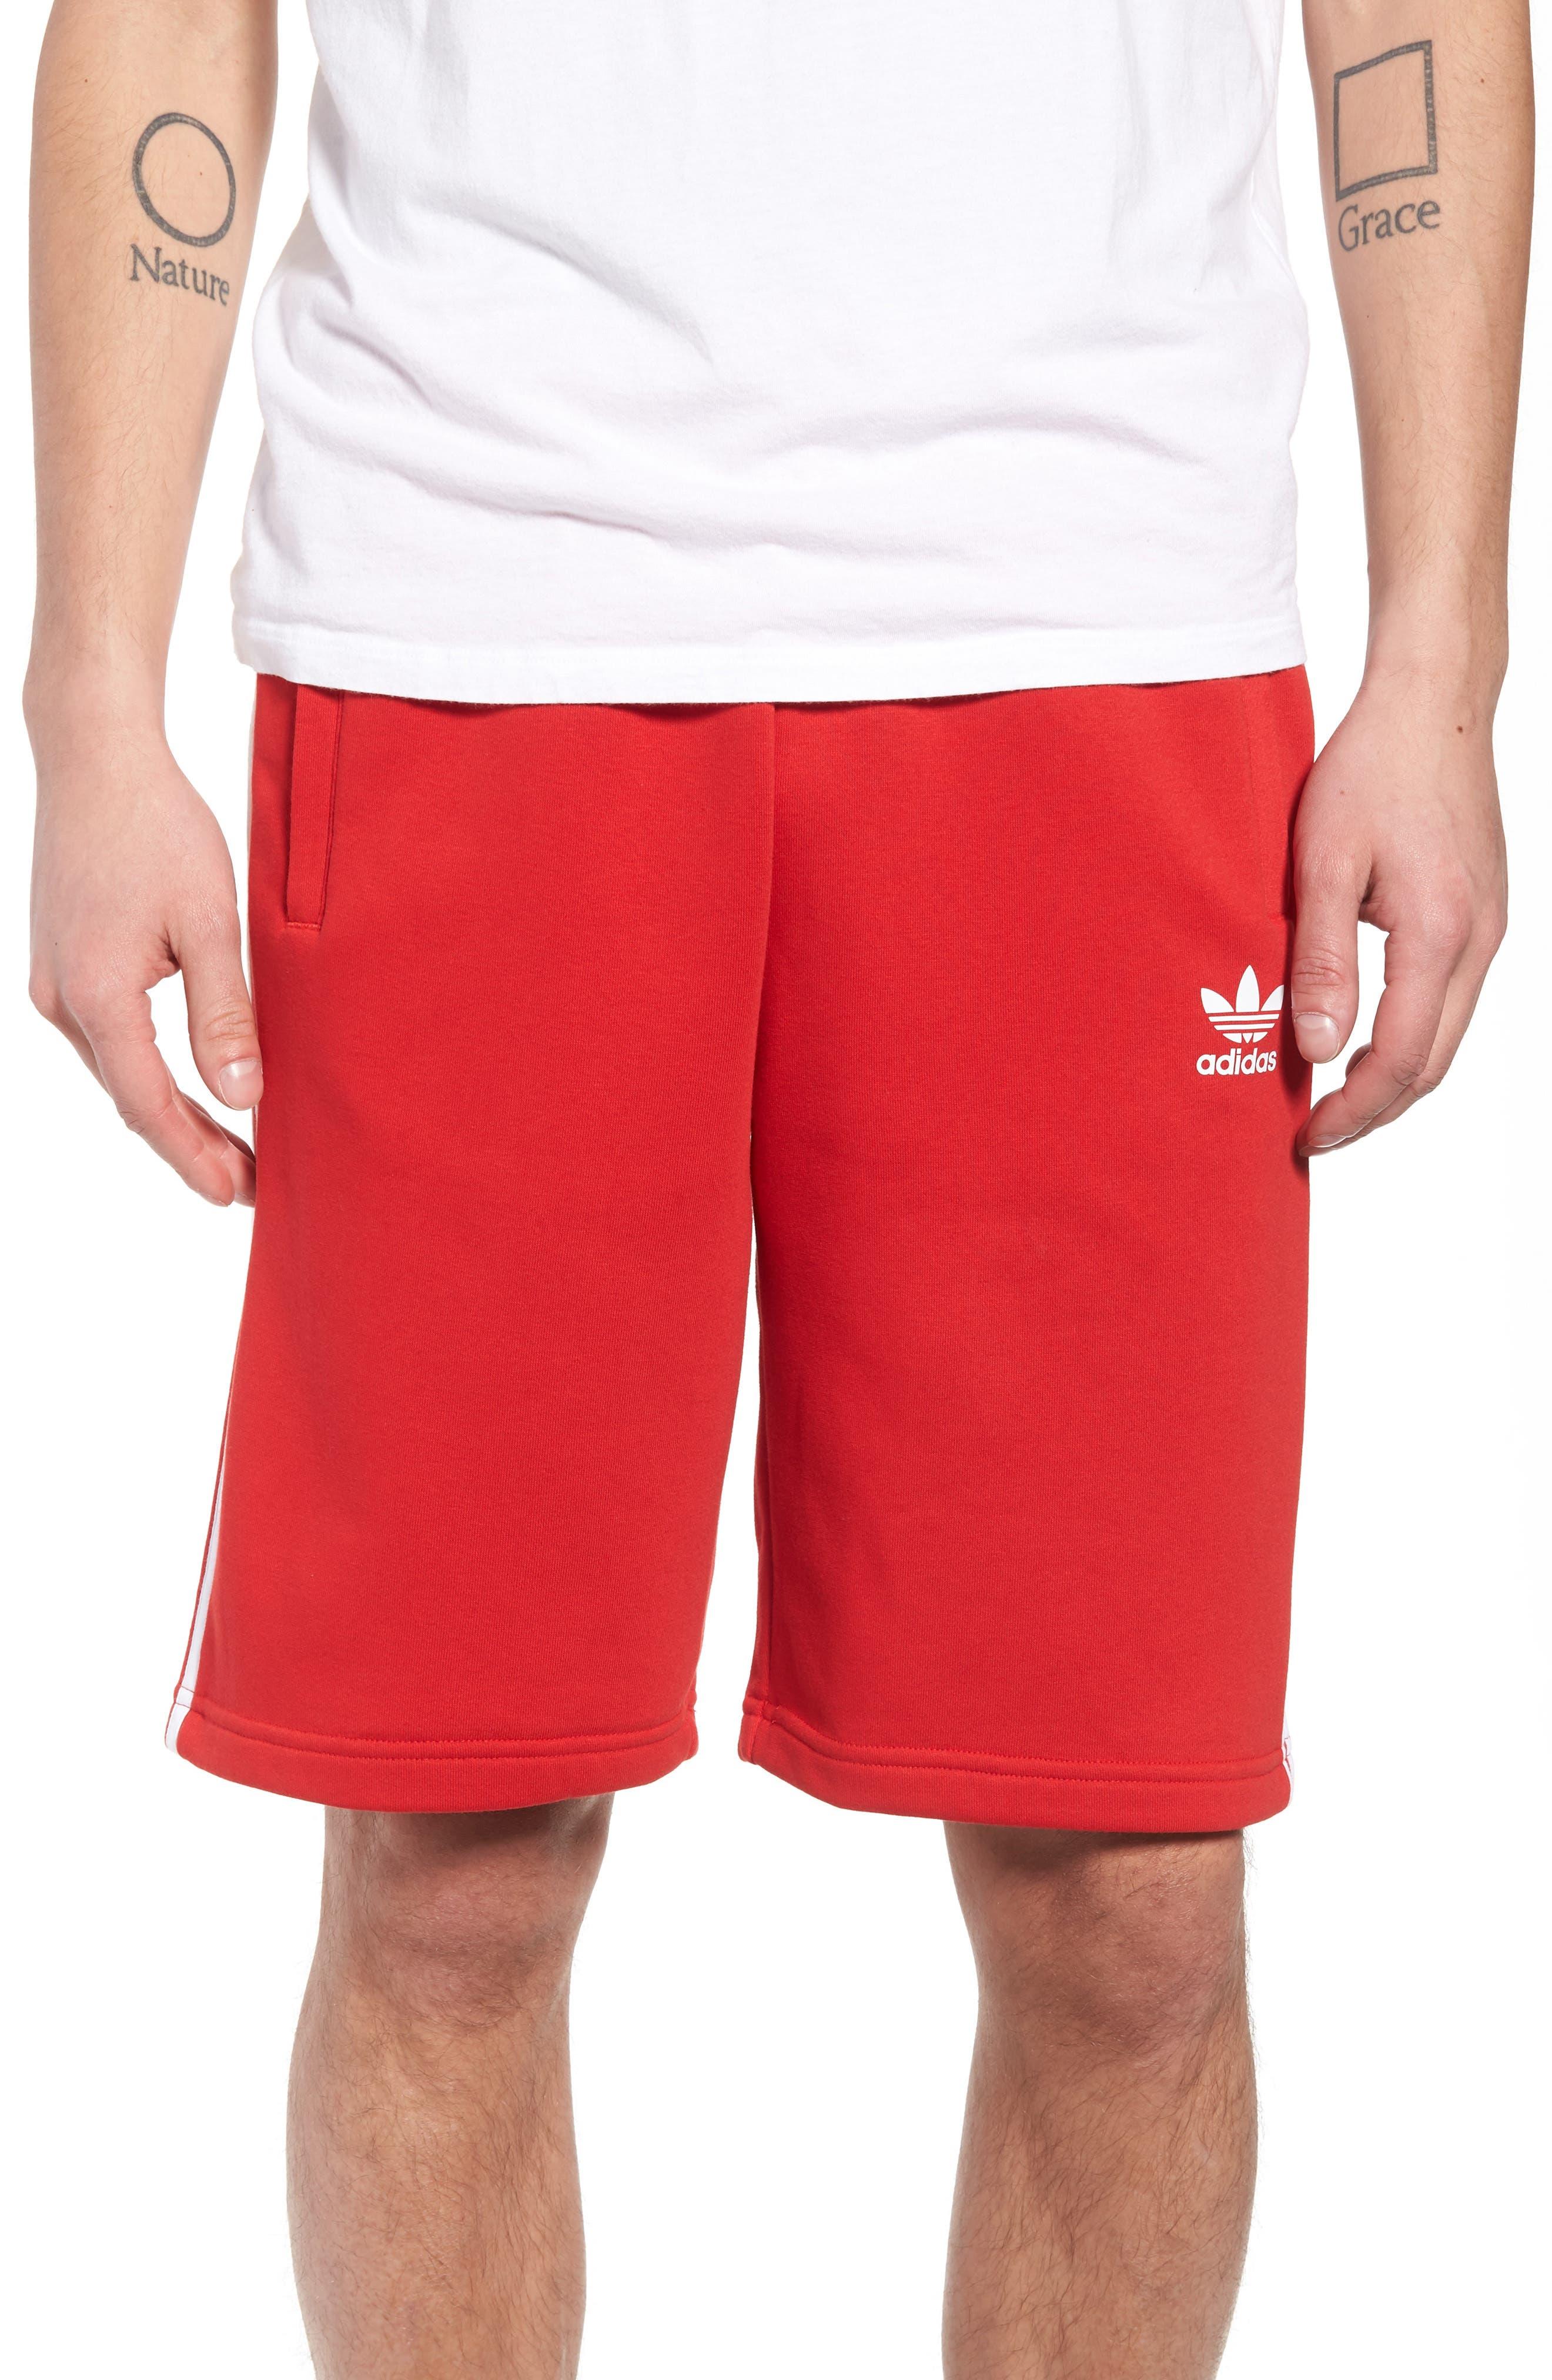 3-Stripes Shorts,                             Main thumbnail 1, color,                             610